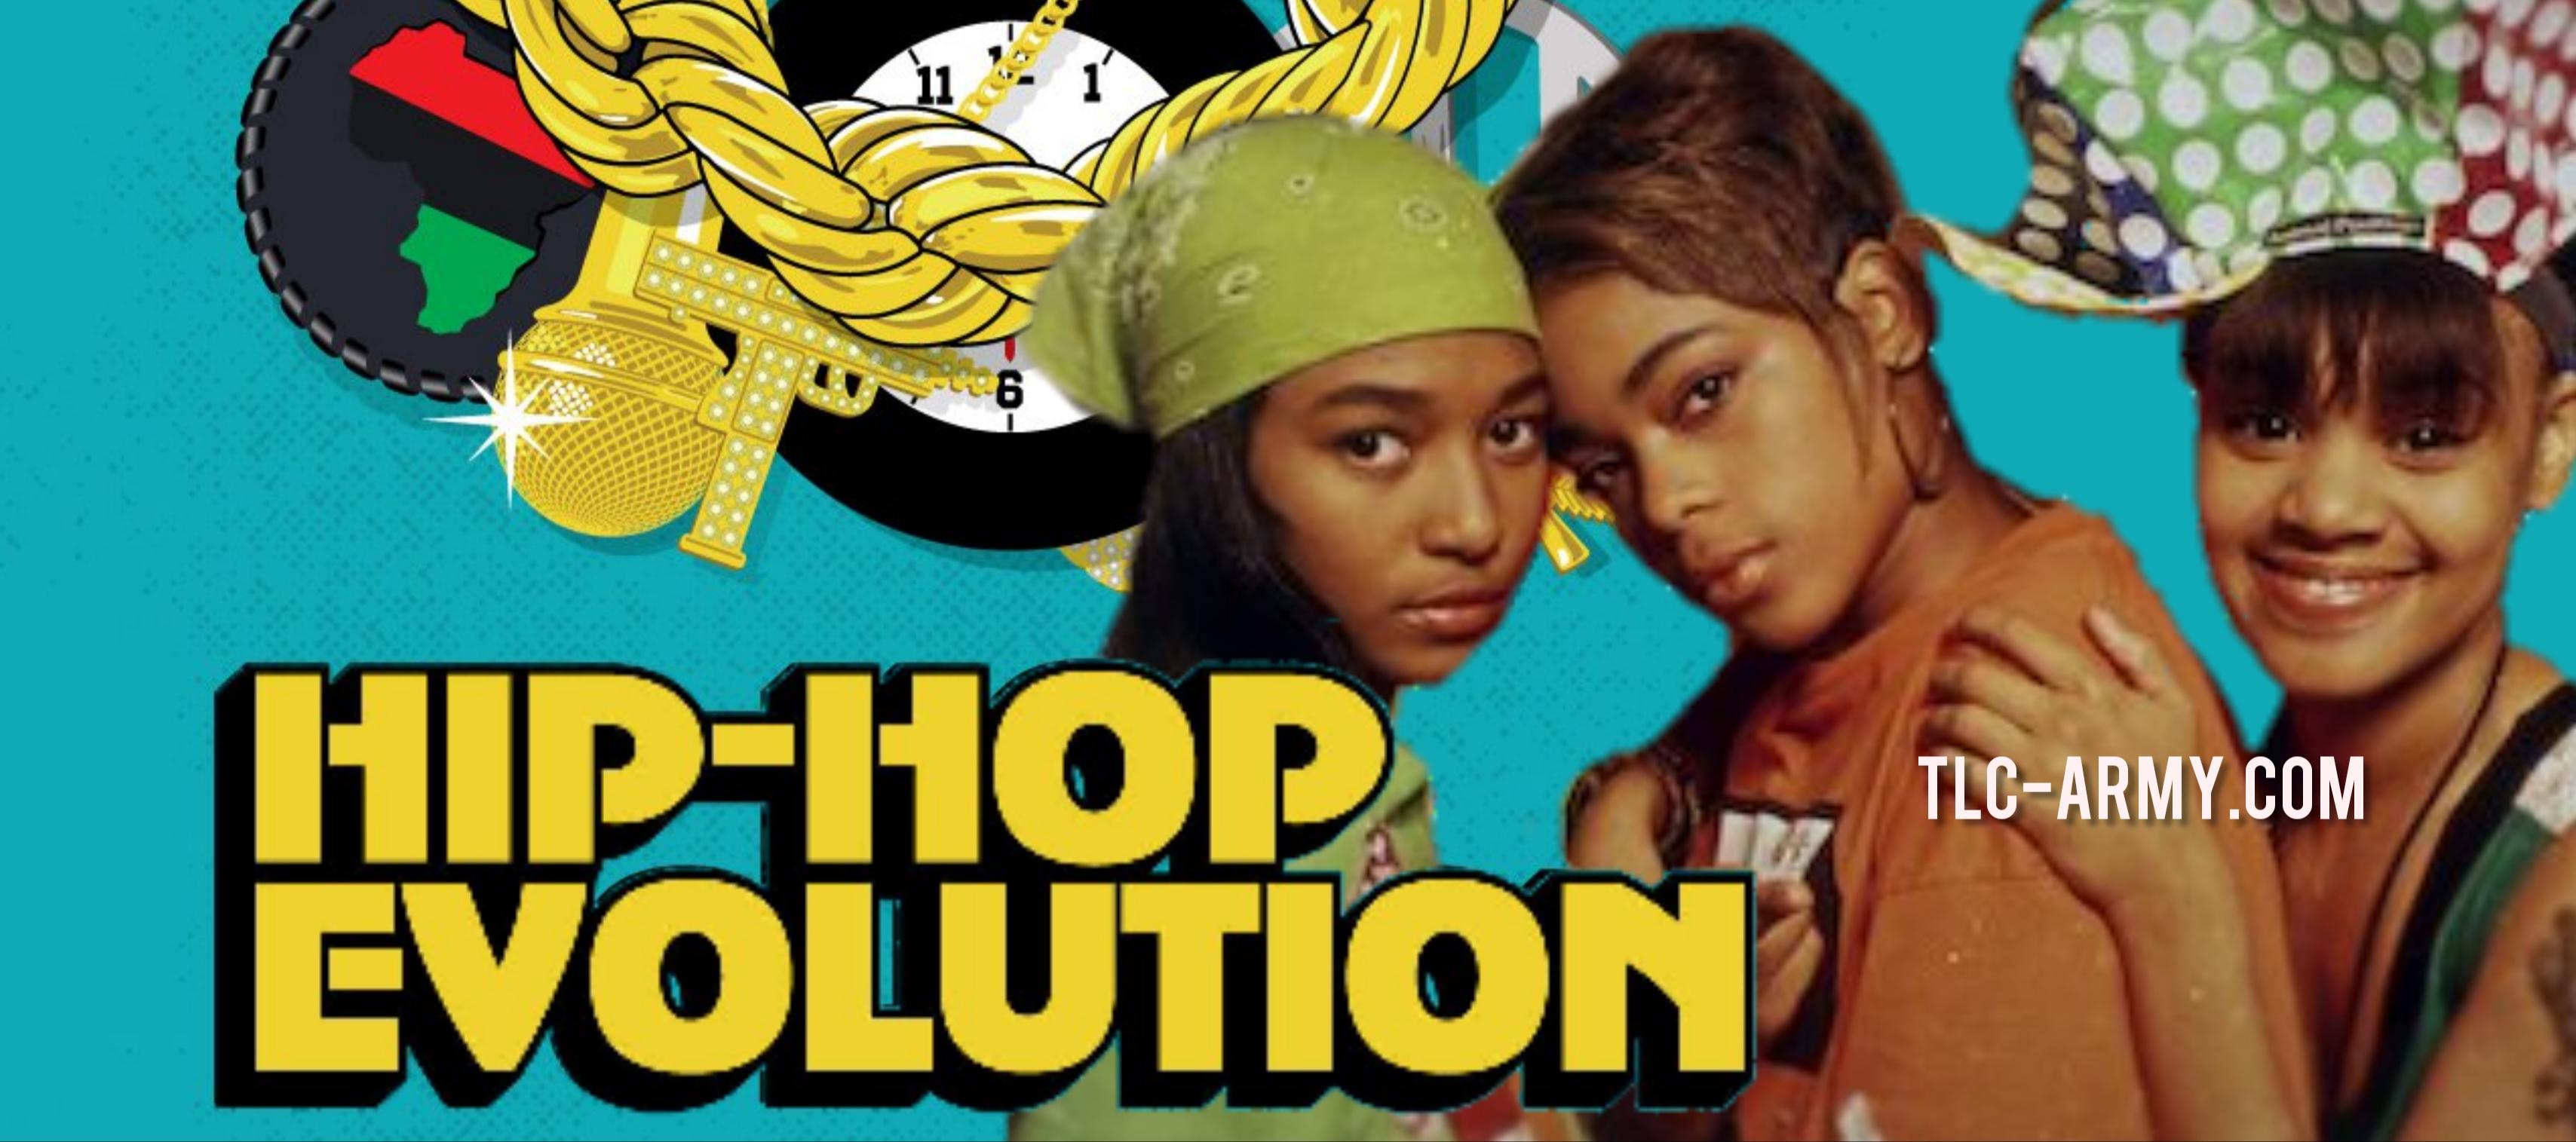 "T-Boz Stars In Netflix Series 'Hip-Hop Evolution': ""Atlanta Was The Twerk Capital!"""